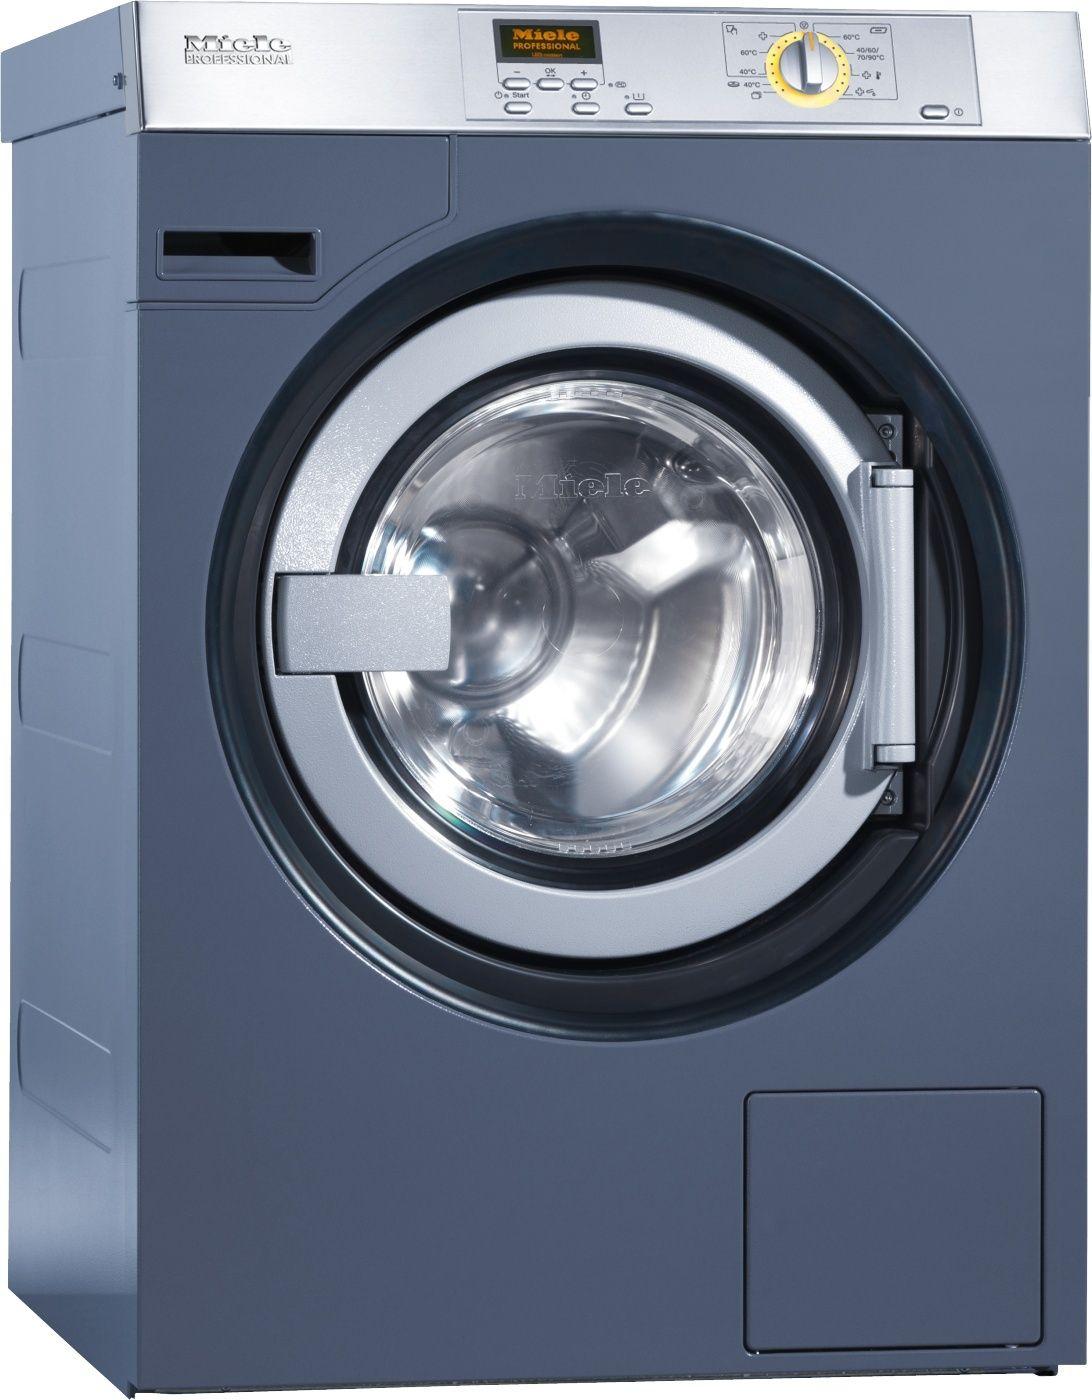 620ce9fa053e43 Machine à laver pw 5104 mopstar Produit neuf